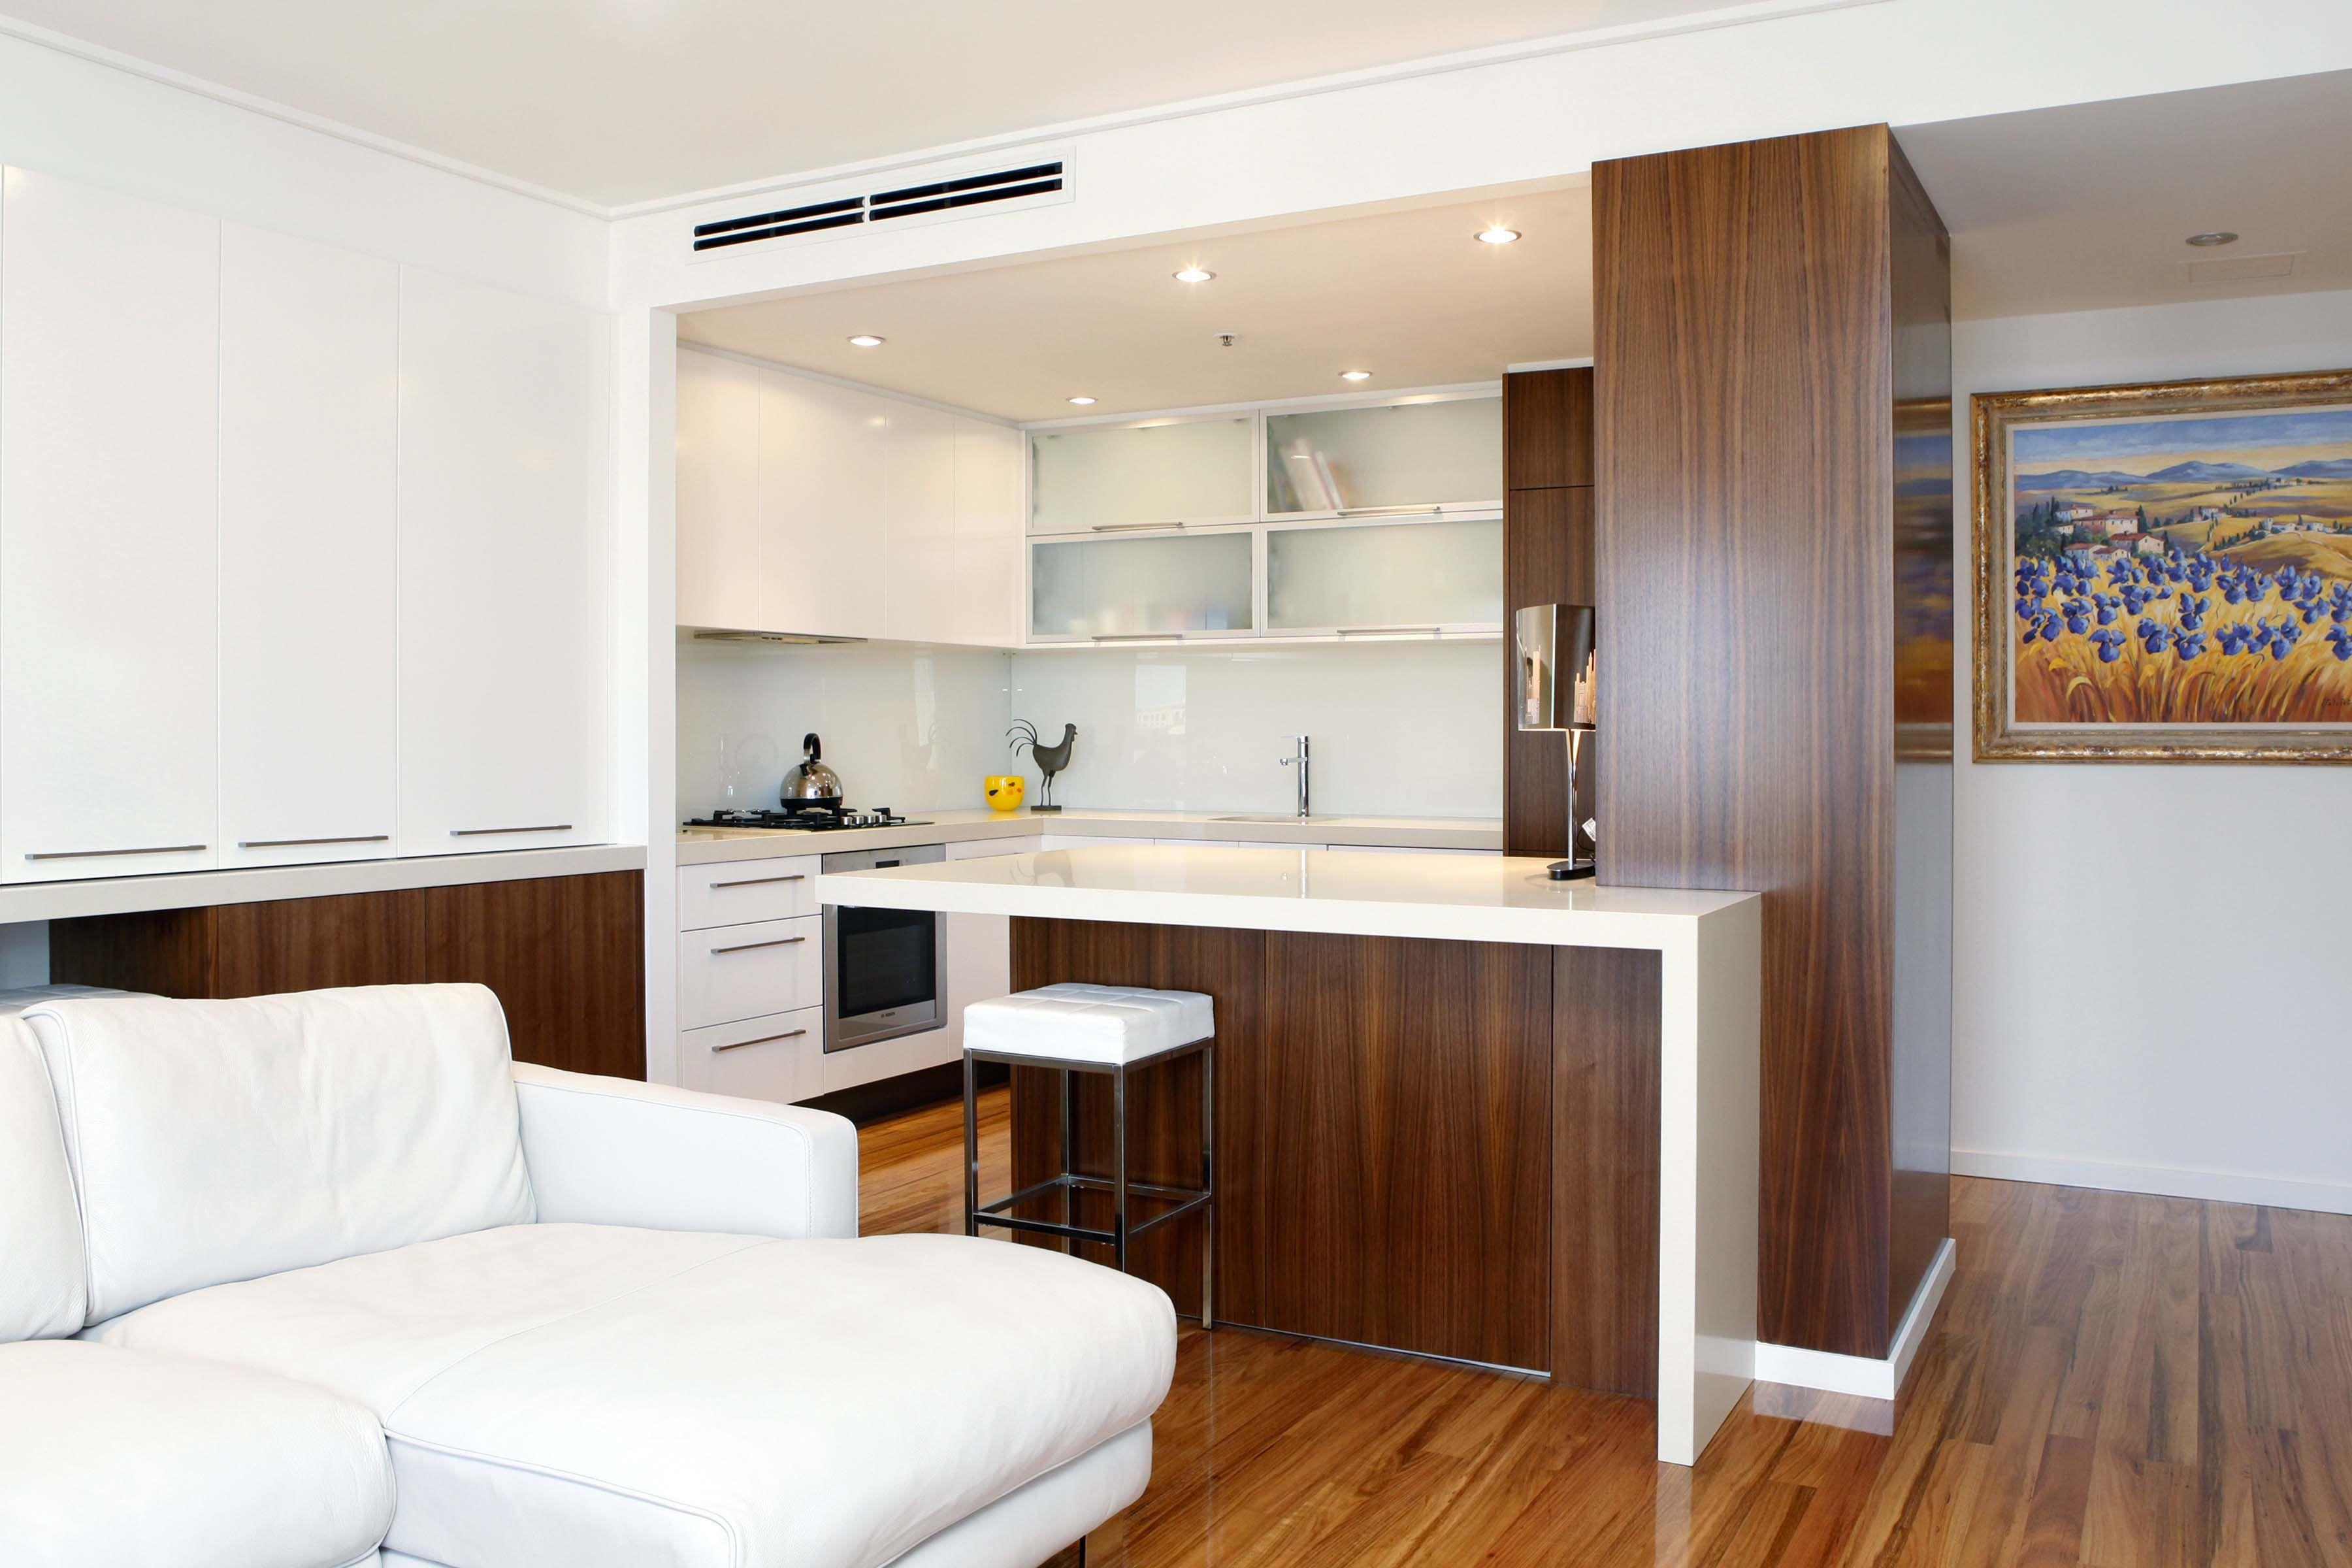 Contemporary Kitchen - The Kitchen Place - Melbourne, Australia